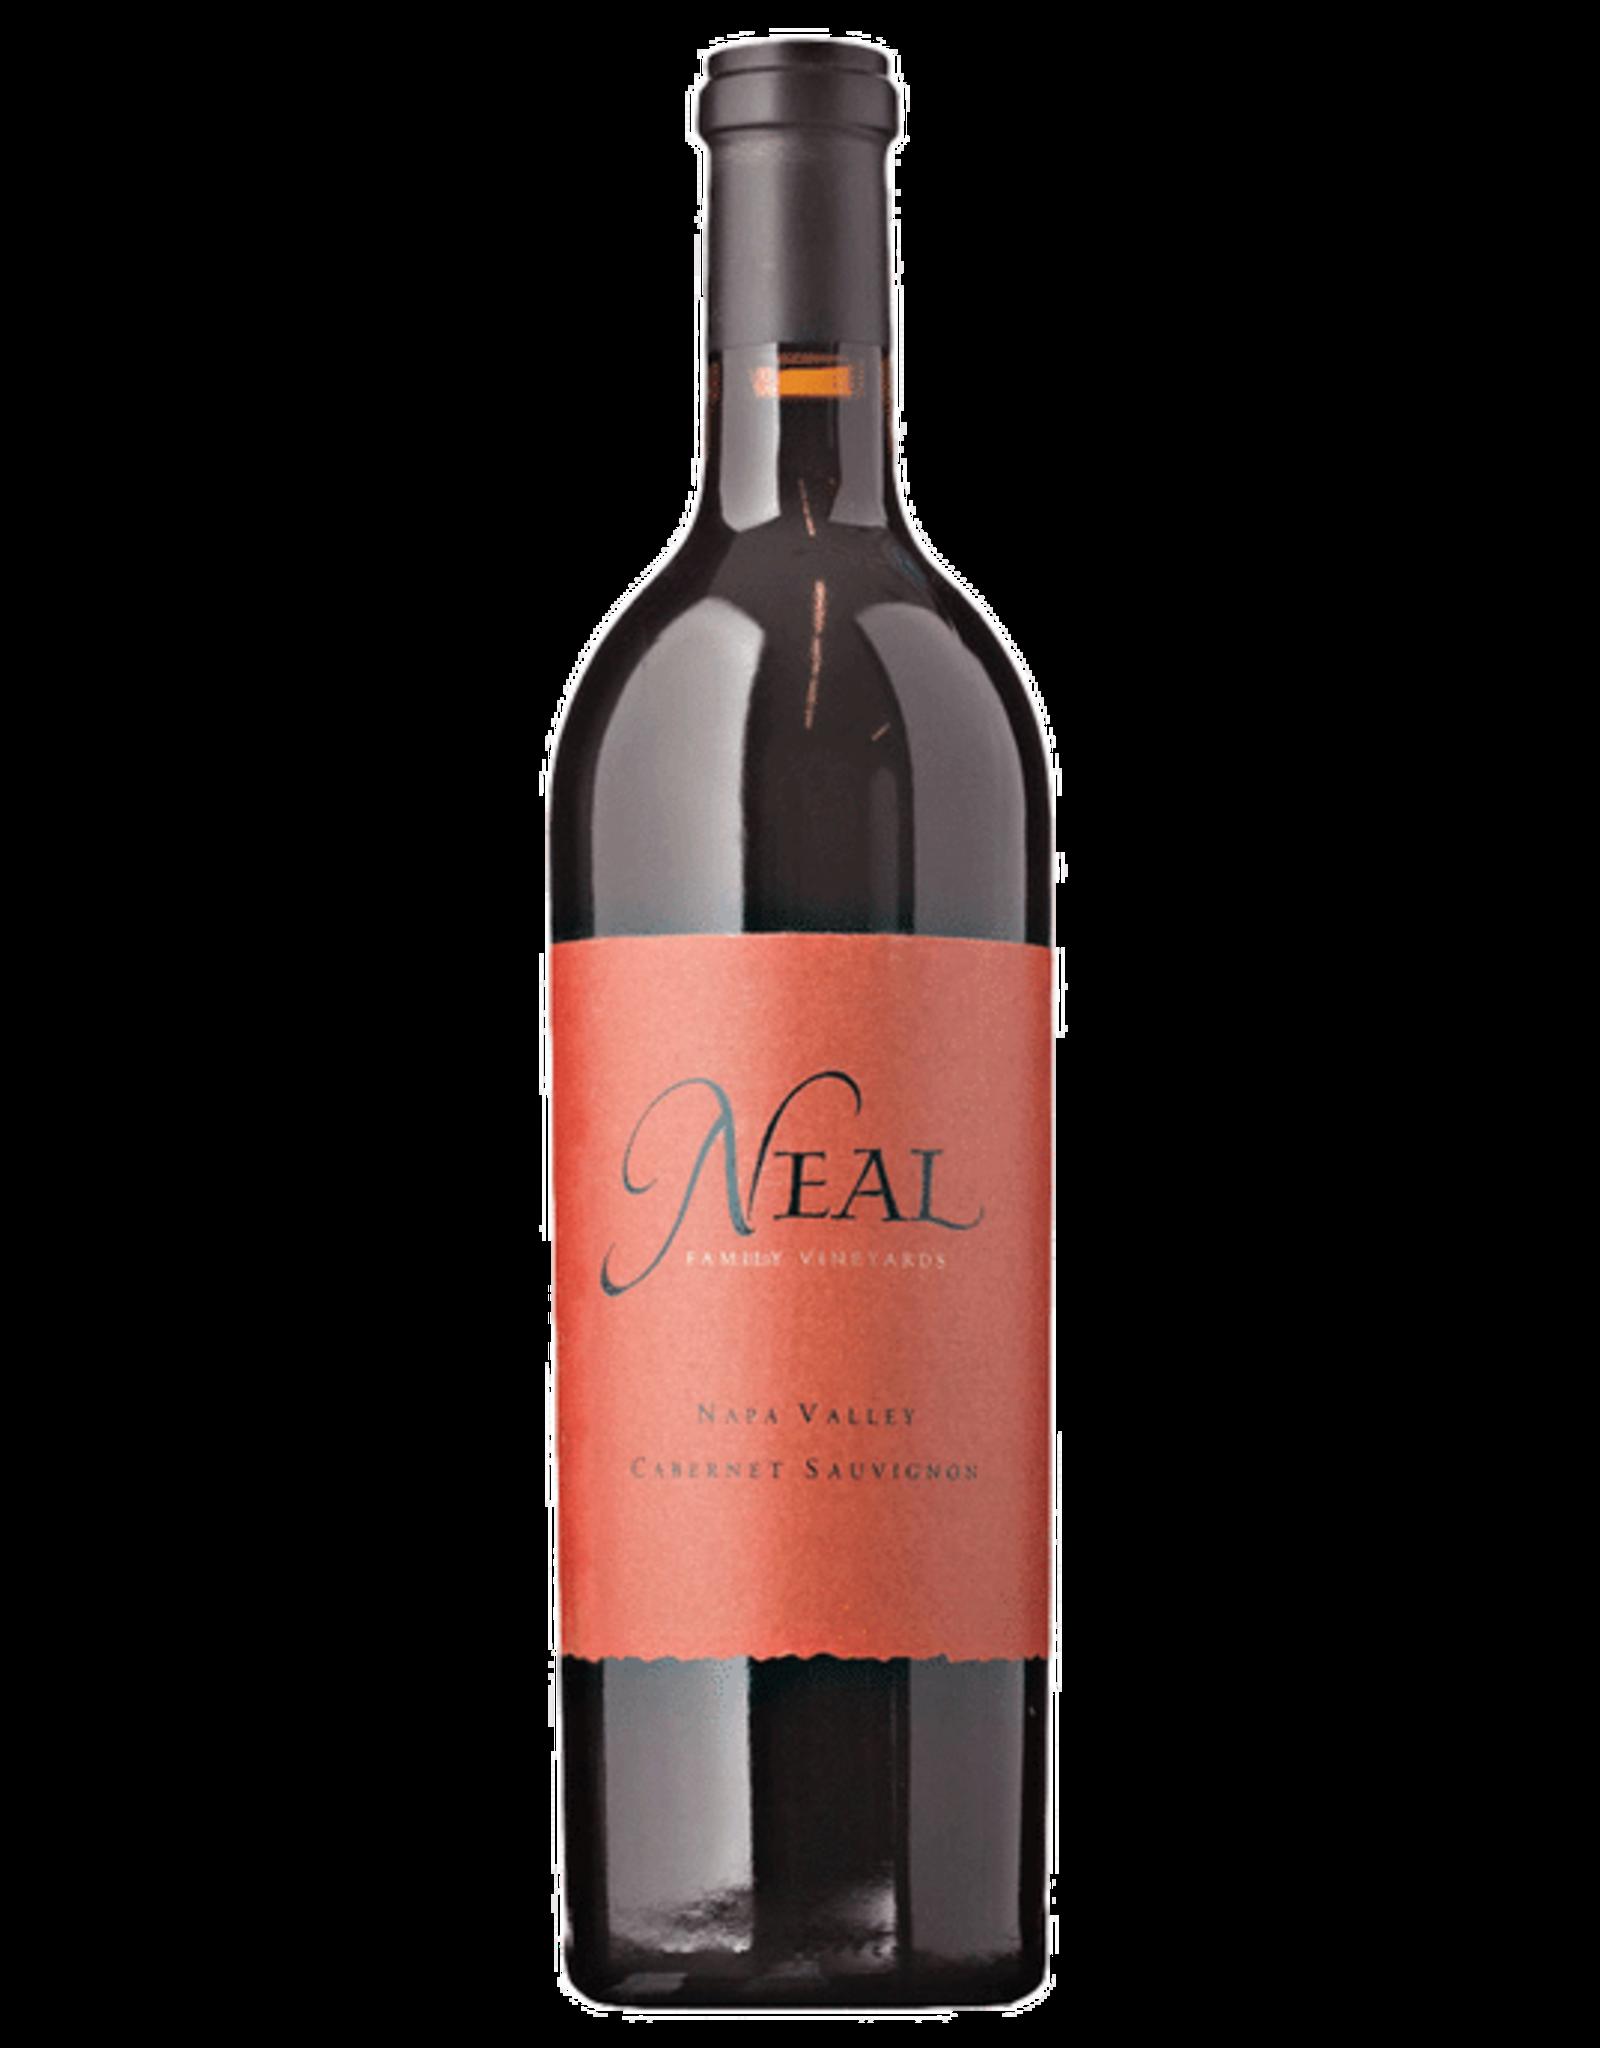 Neal Family Vineyards Cabernet Sauvignon